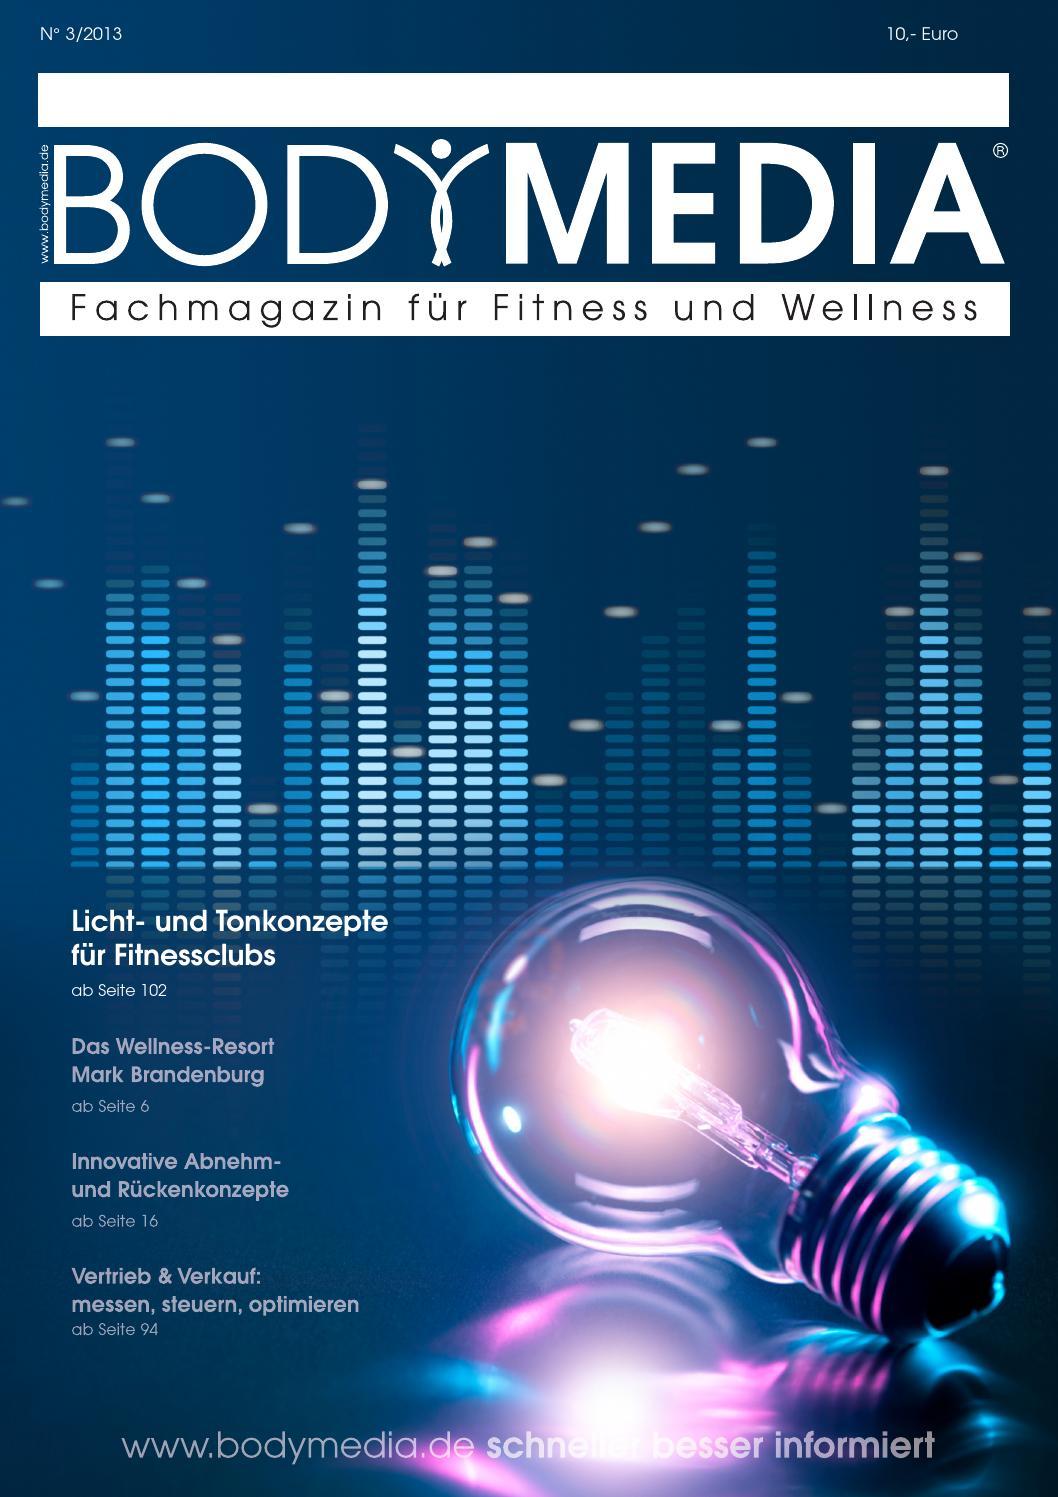 Bodymedia 32013 by Jonathan Schneidemesser issuu